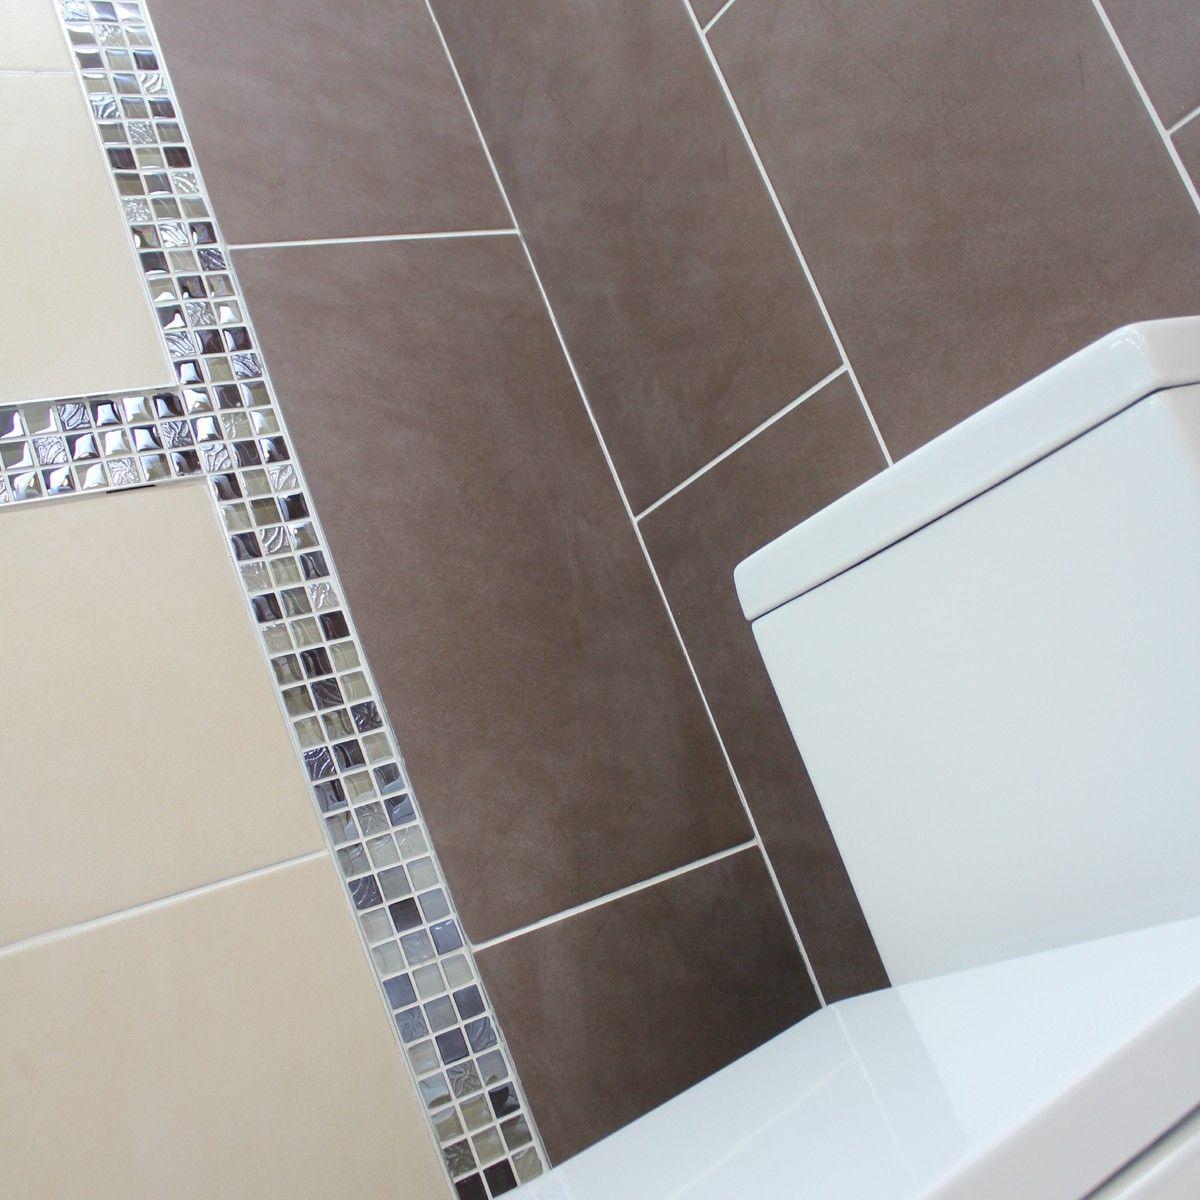 Tanami mocha 60x30 bathroom ideas pinterest tiles online crown tiles online shop stocks large ranges of tiles dailygadgetfo Images